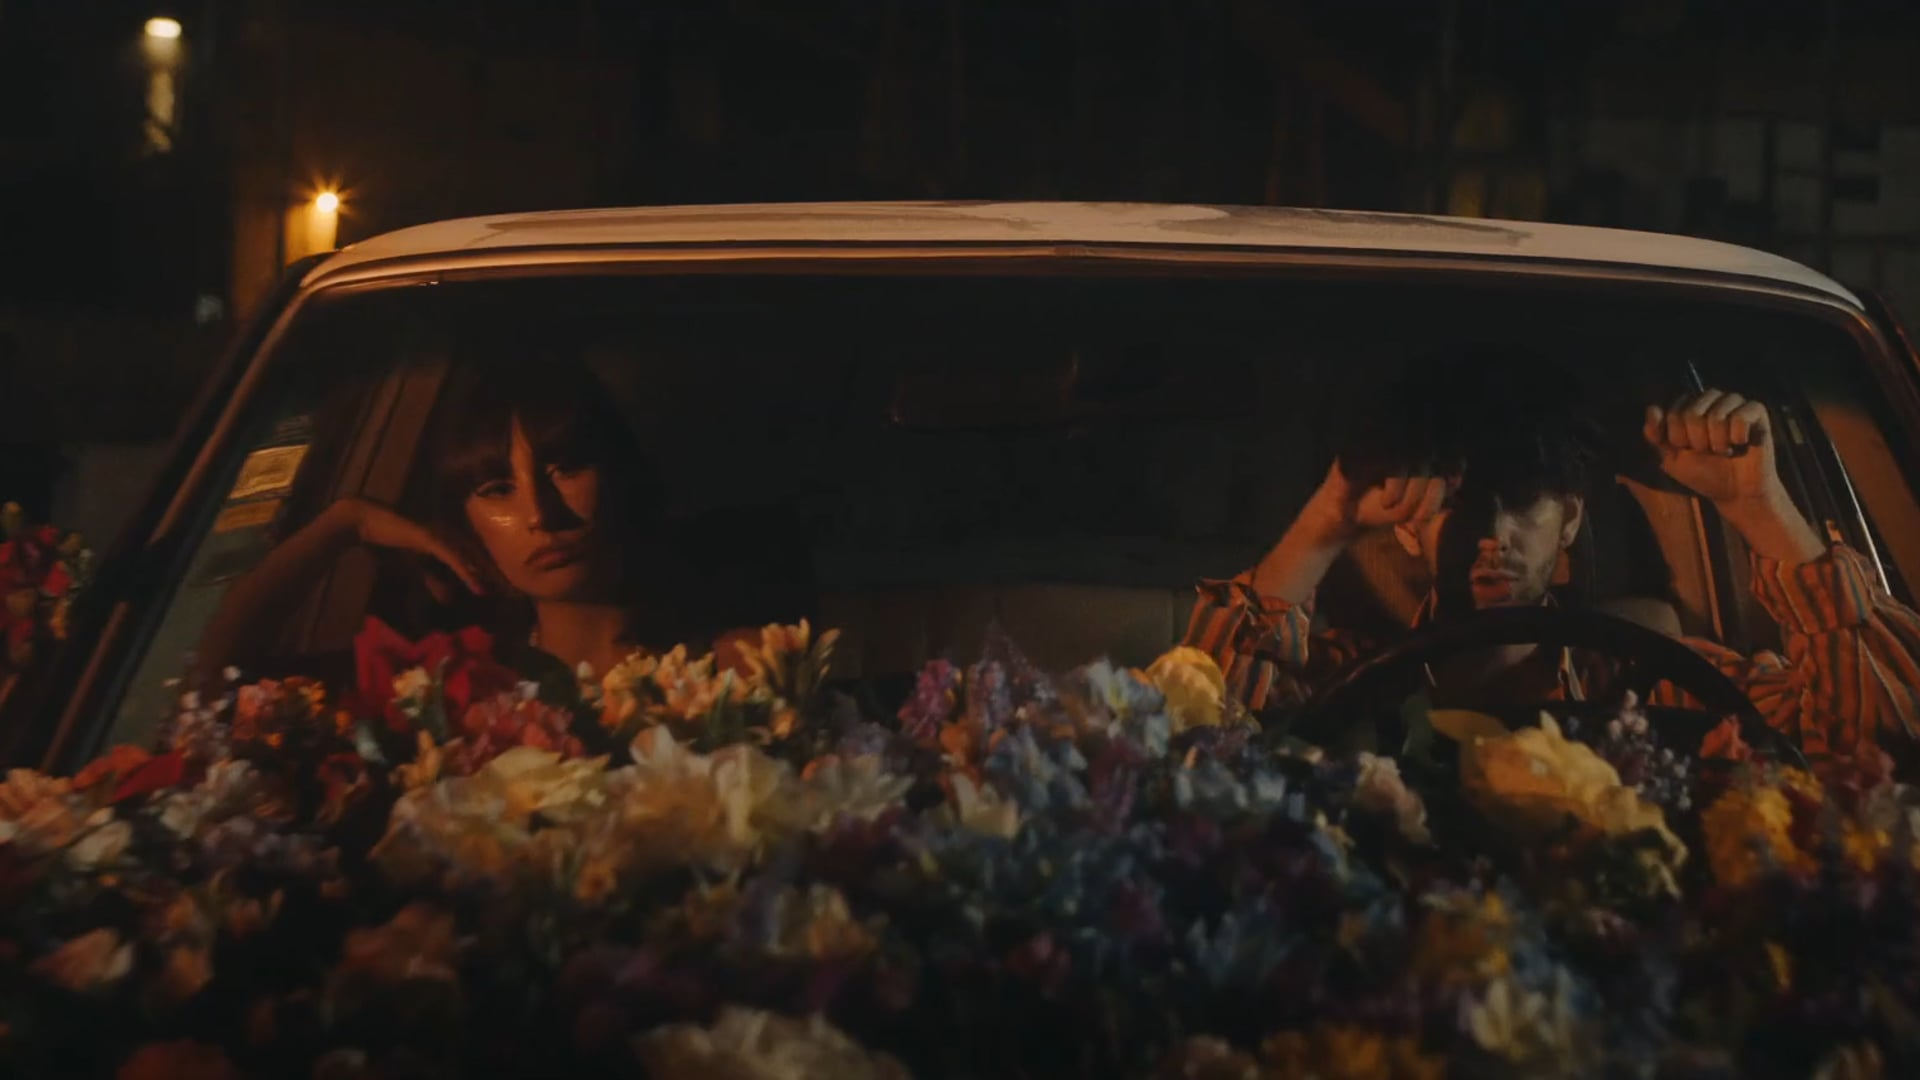 Bonnie & Clyde by PrettieboyJohnson Music Video